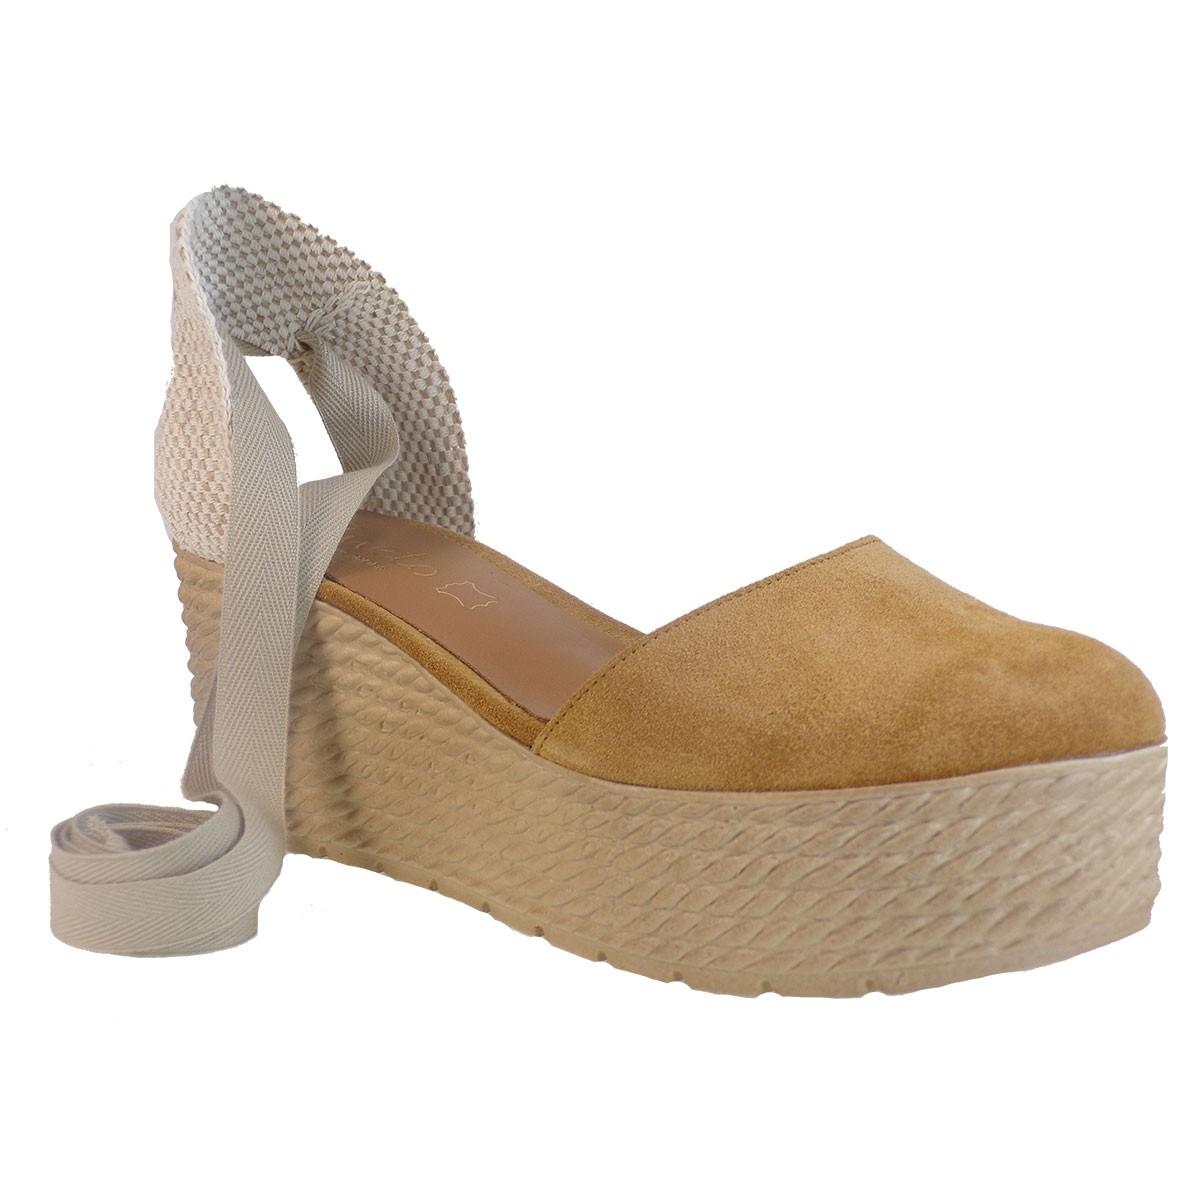 Katia Shoes Anneto Γυναικείες Εσπαντρίγιες Κ155-1087 Κάμελ